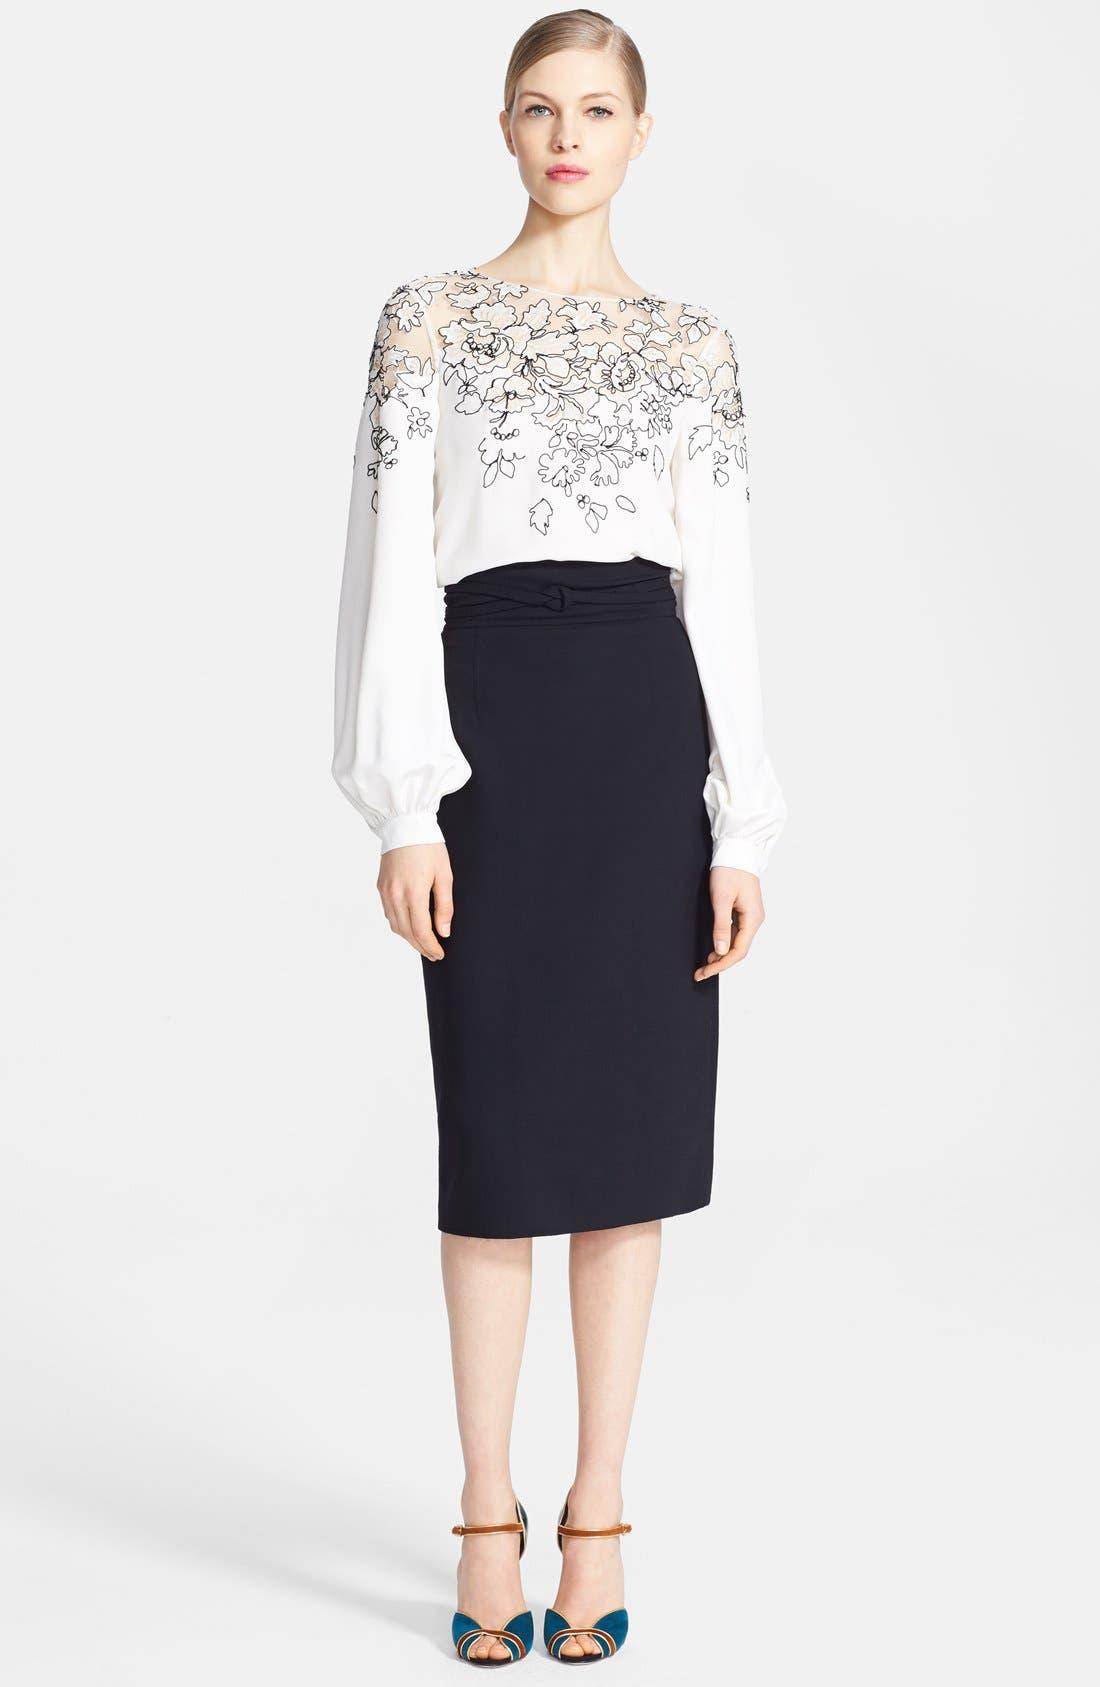 Alternate Image 1 Selected - Oscar de la Renta Embroidered Silk Blouse